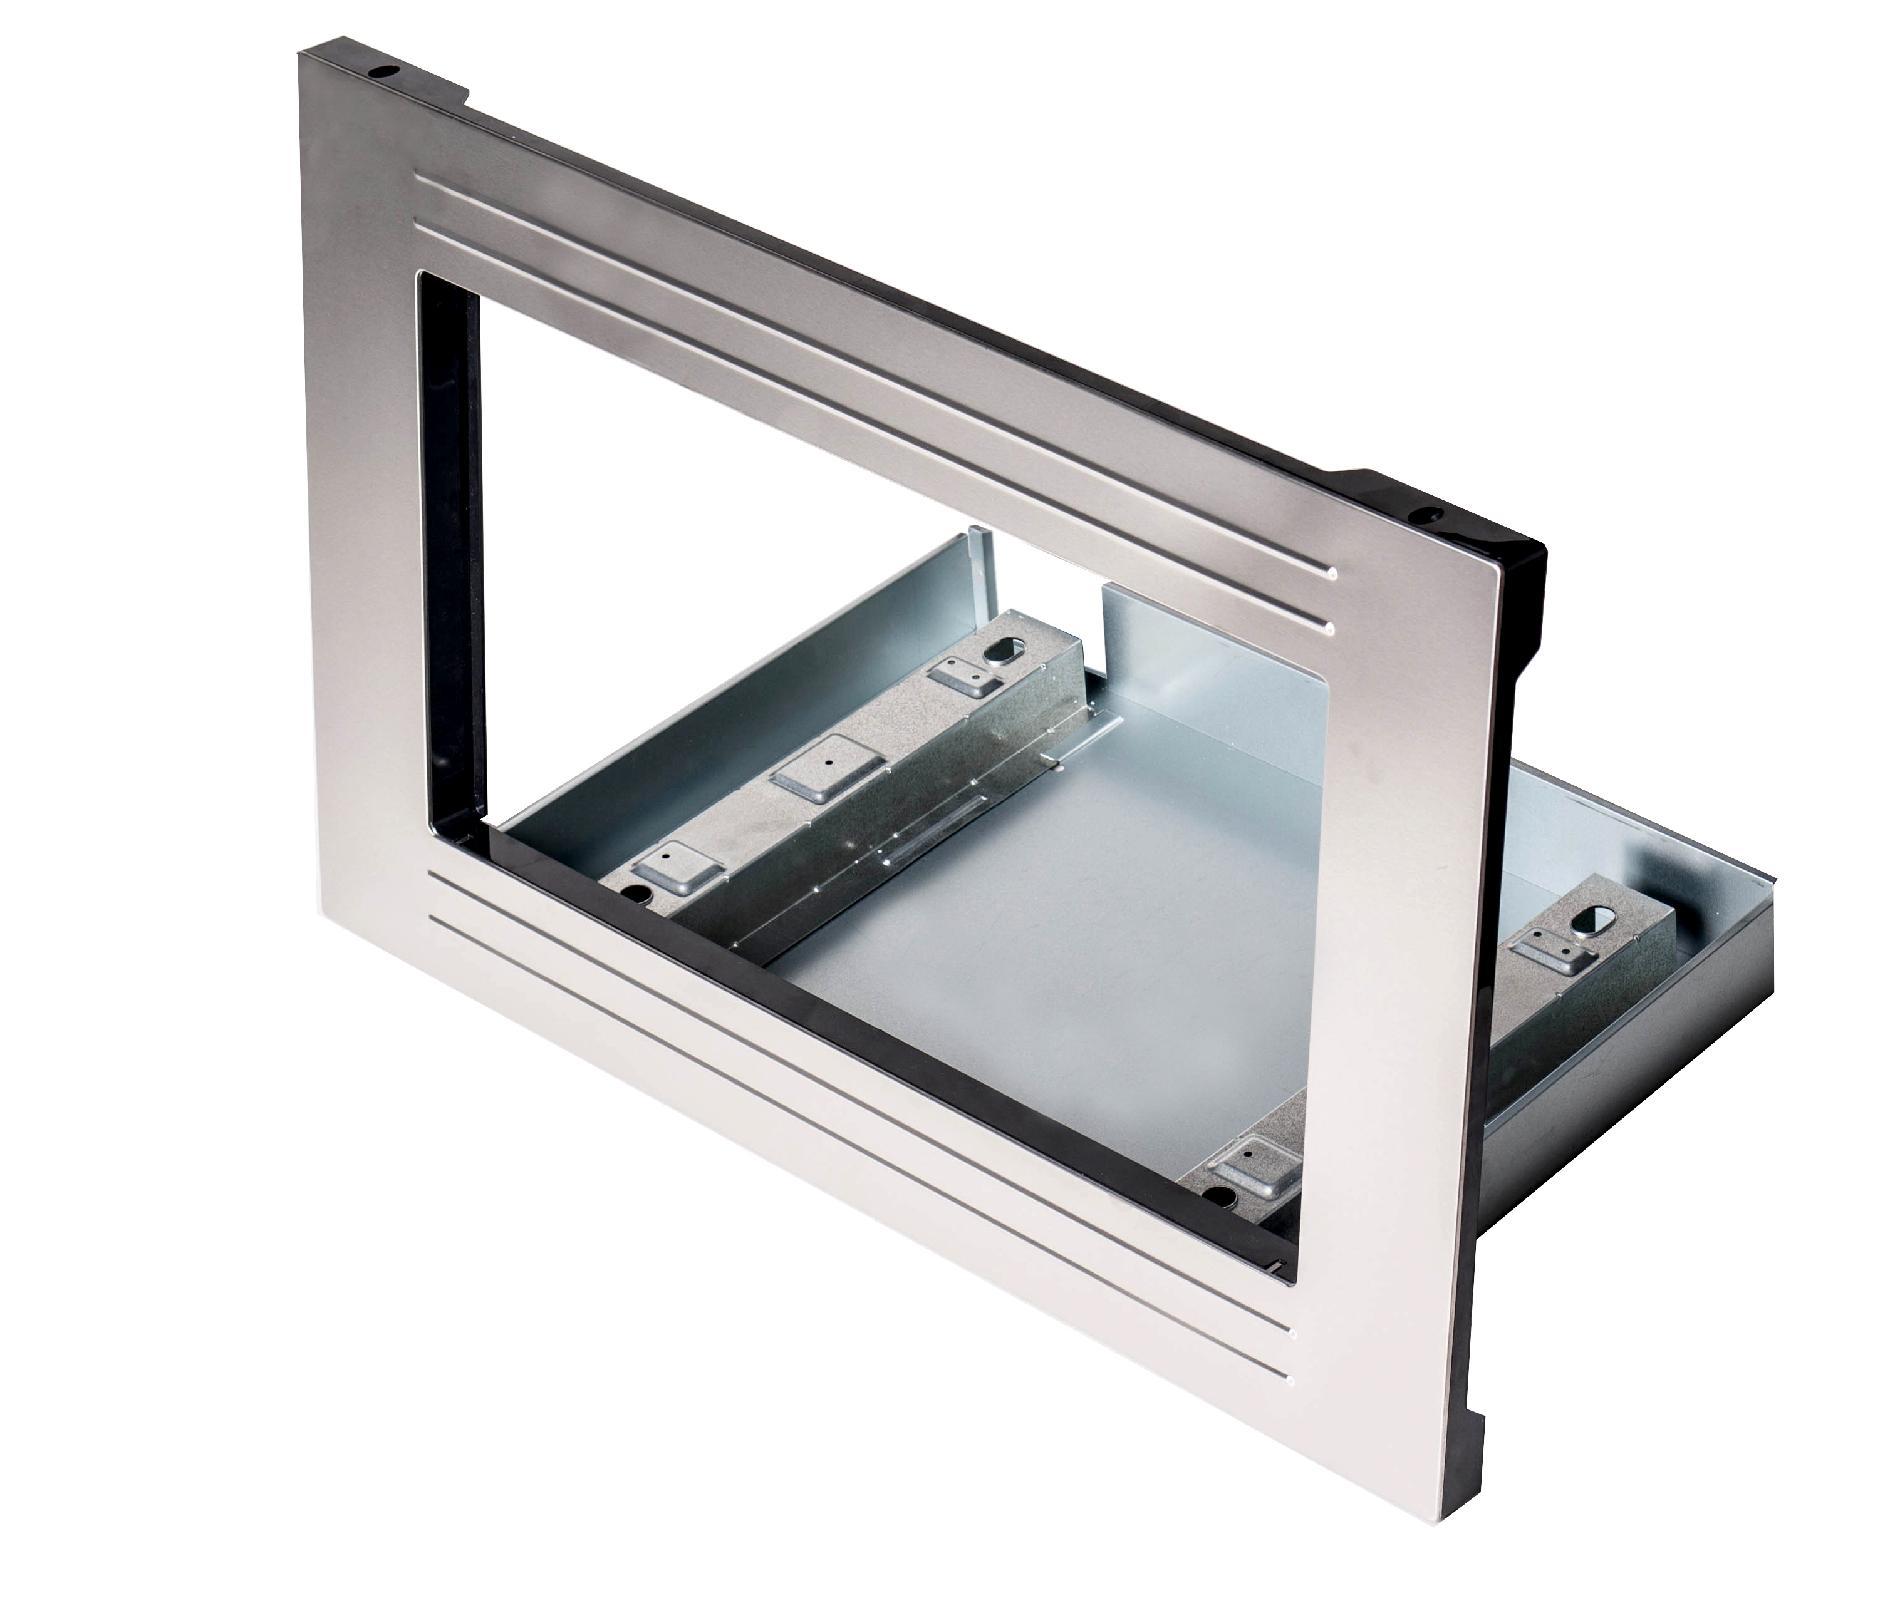 kenmore 23303 30 countertop microwave trim kit stainless